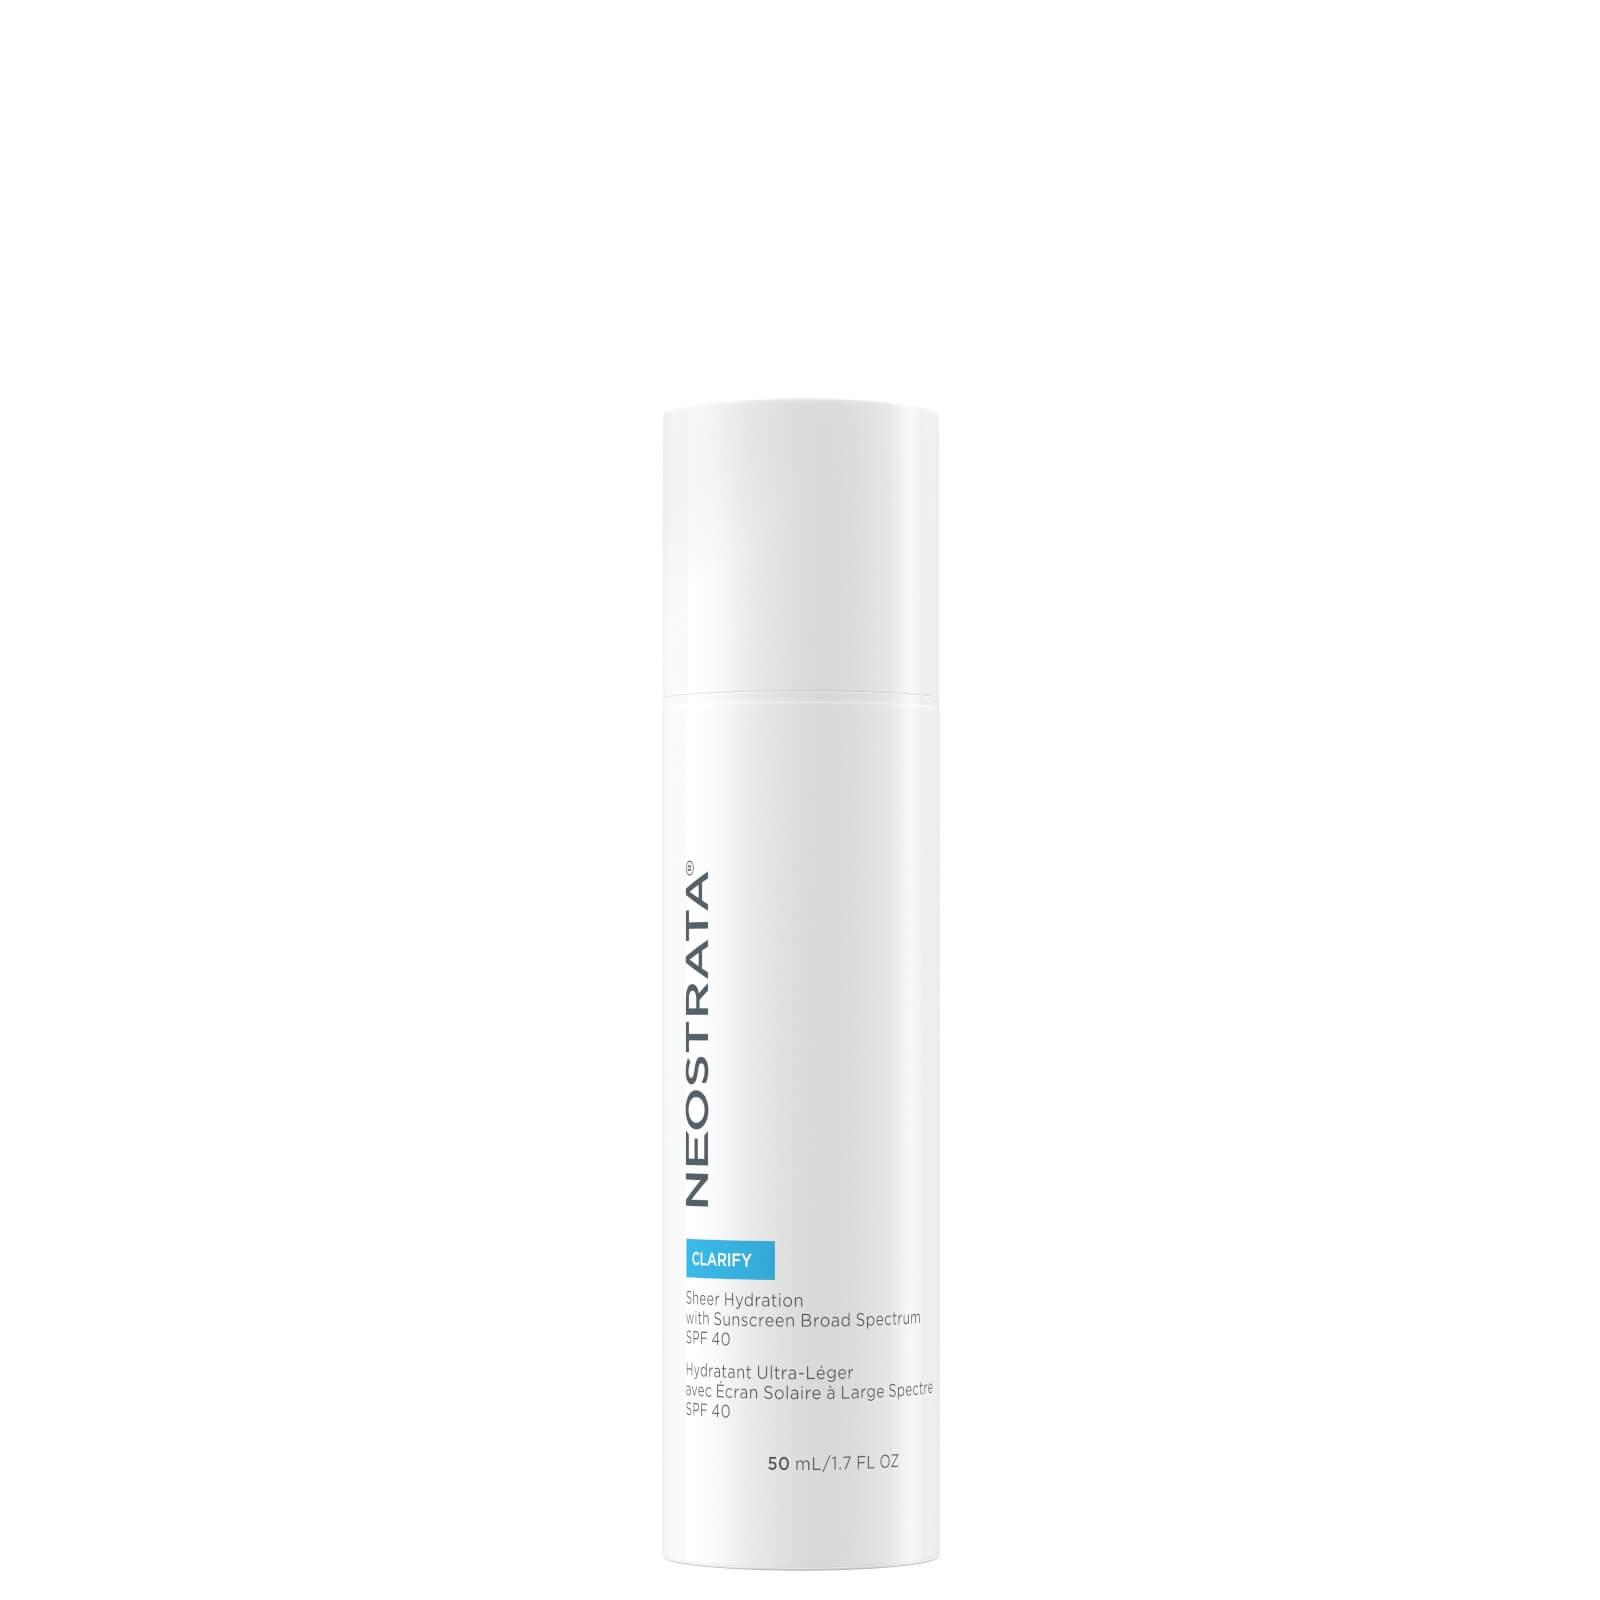 Купить NeoStrata Clarify Sheer Hydration Sunscreen Broad Spectrum SPF40 50ml